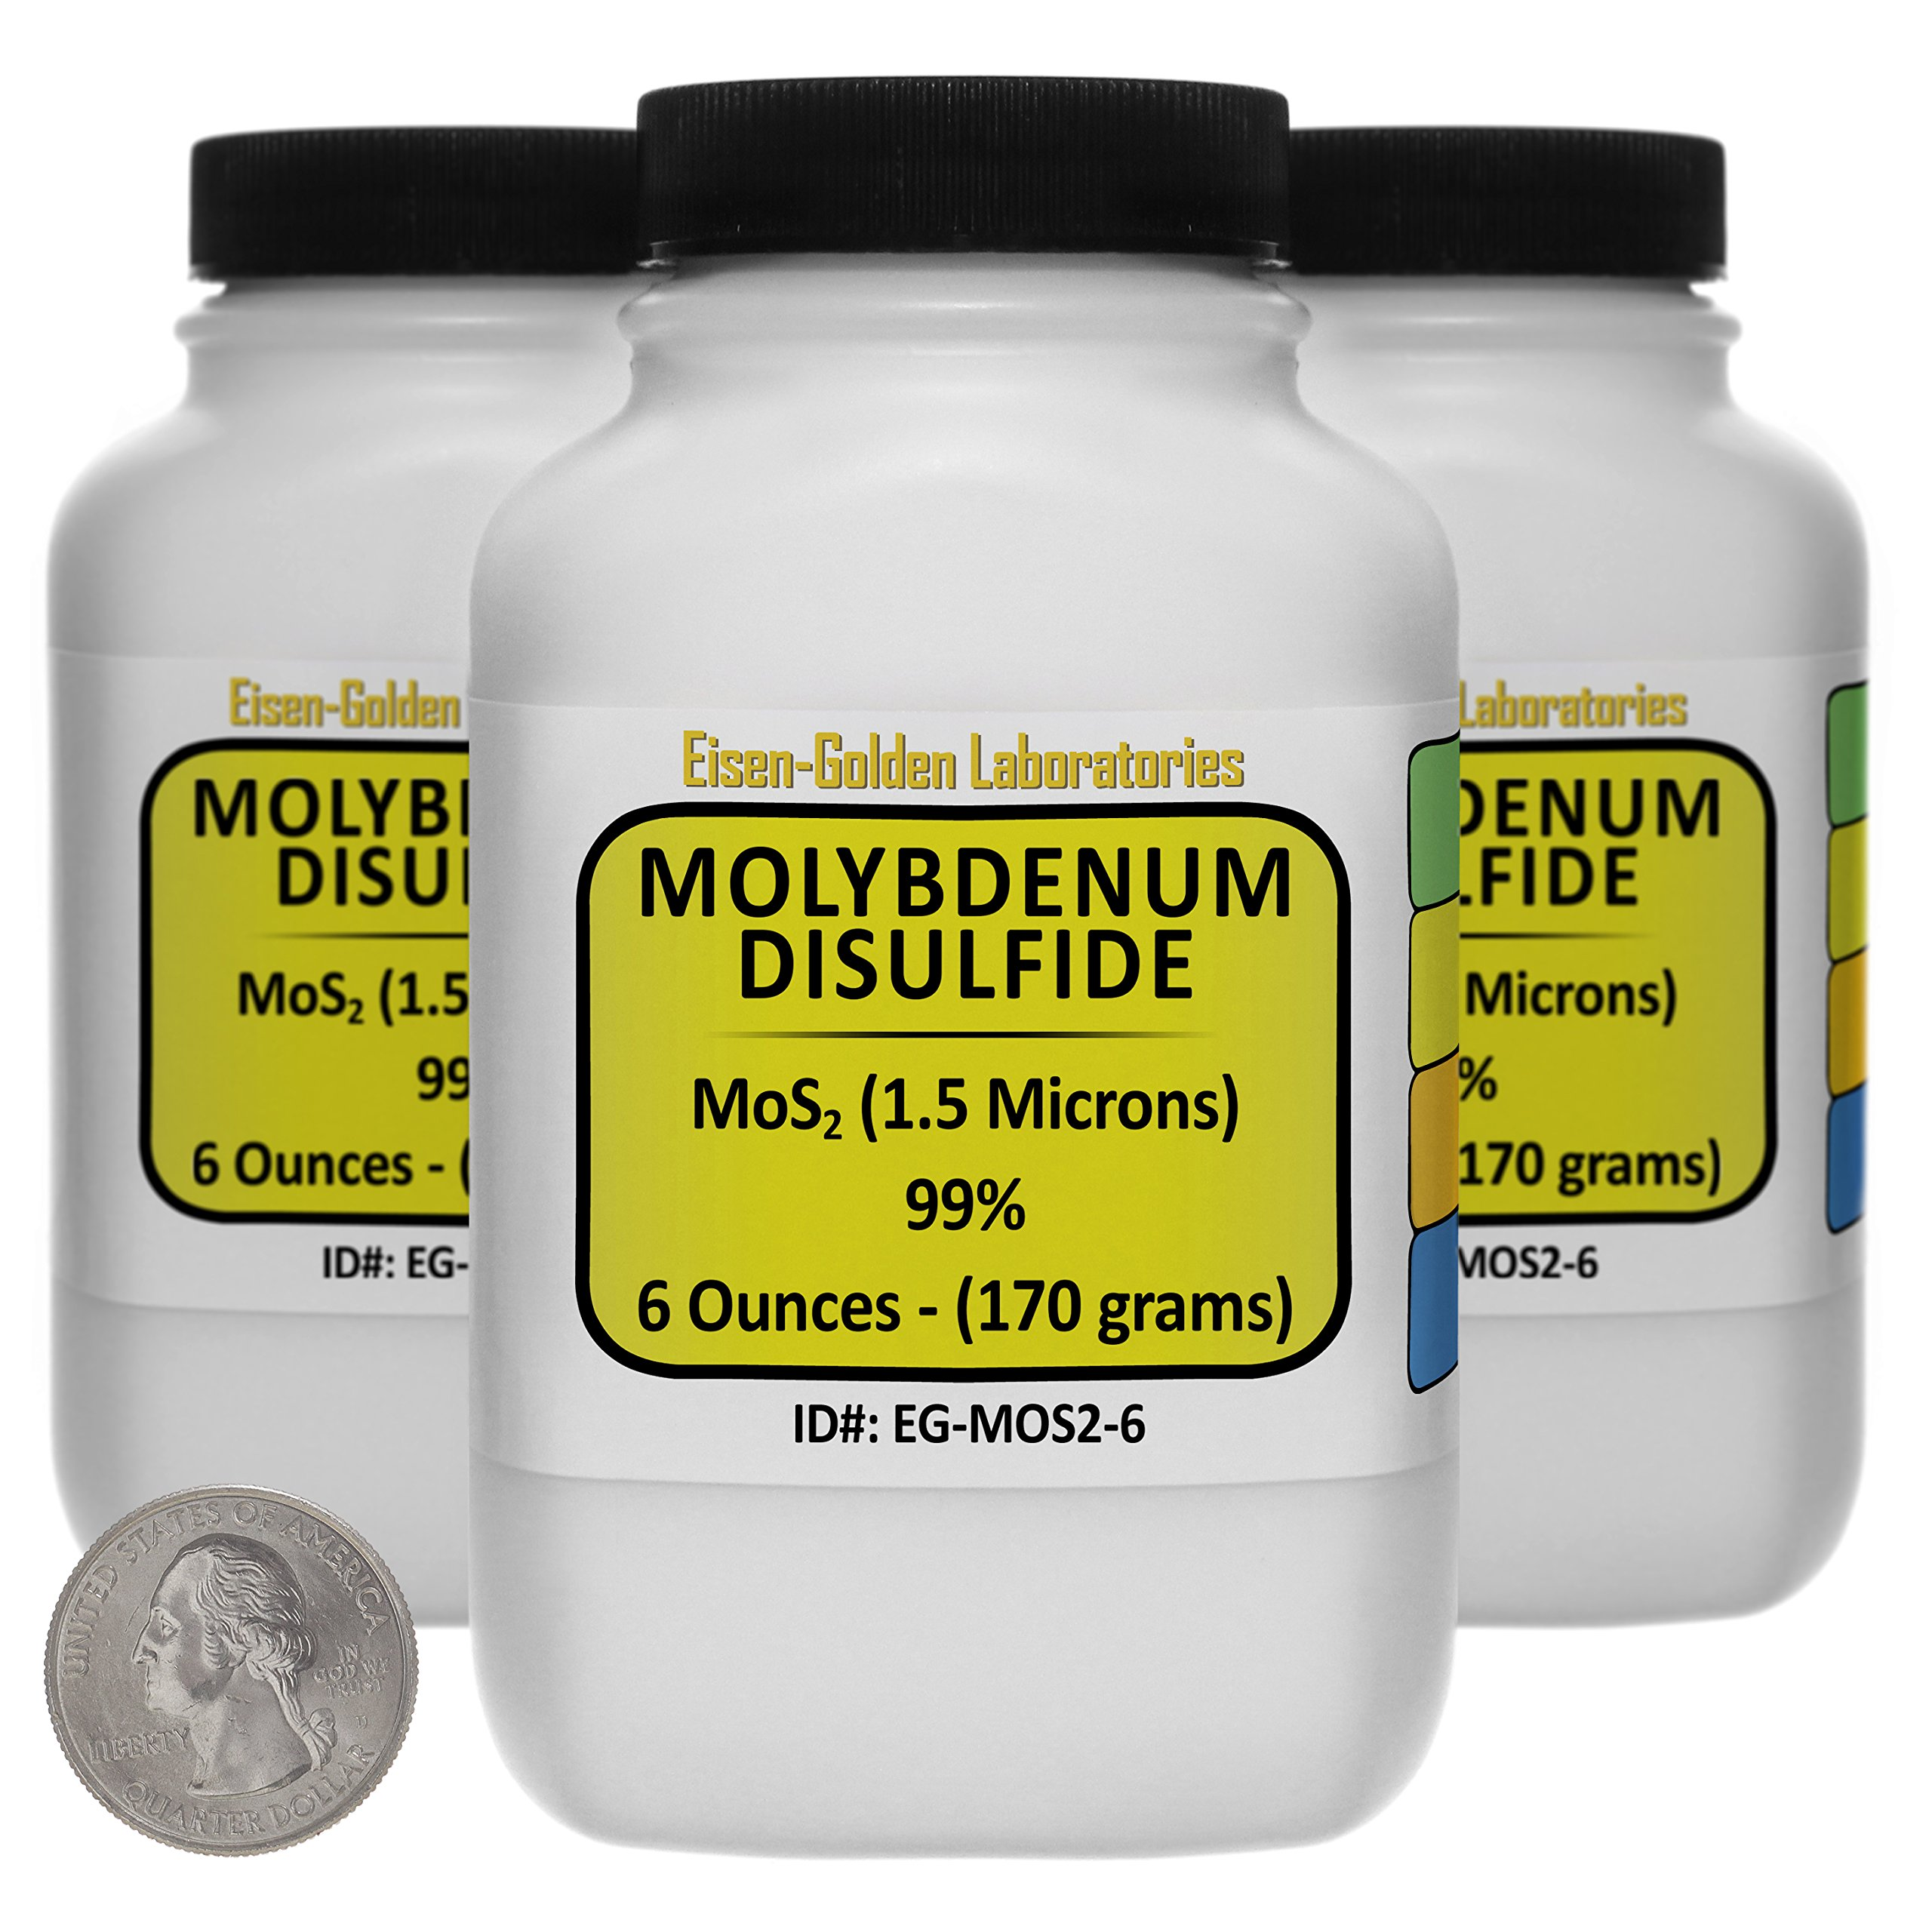 Molybdenum Disulfide [MoS2] 99% AR Grade Powder 1 Lb in Three Space-Saver Bottles USA